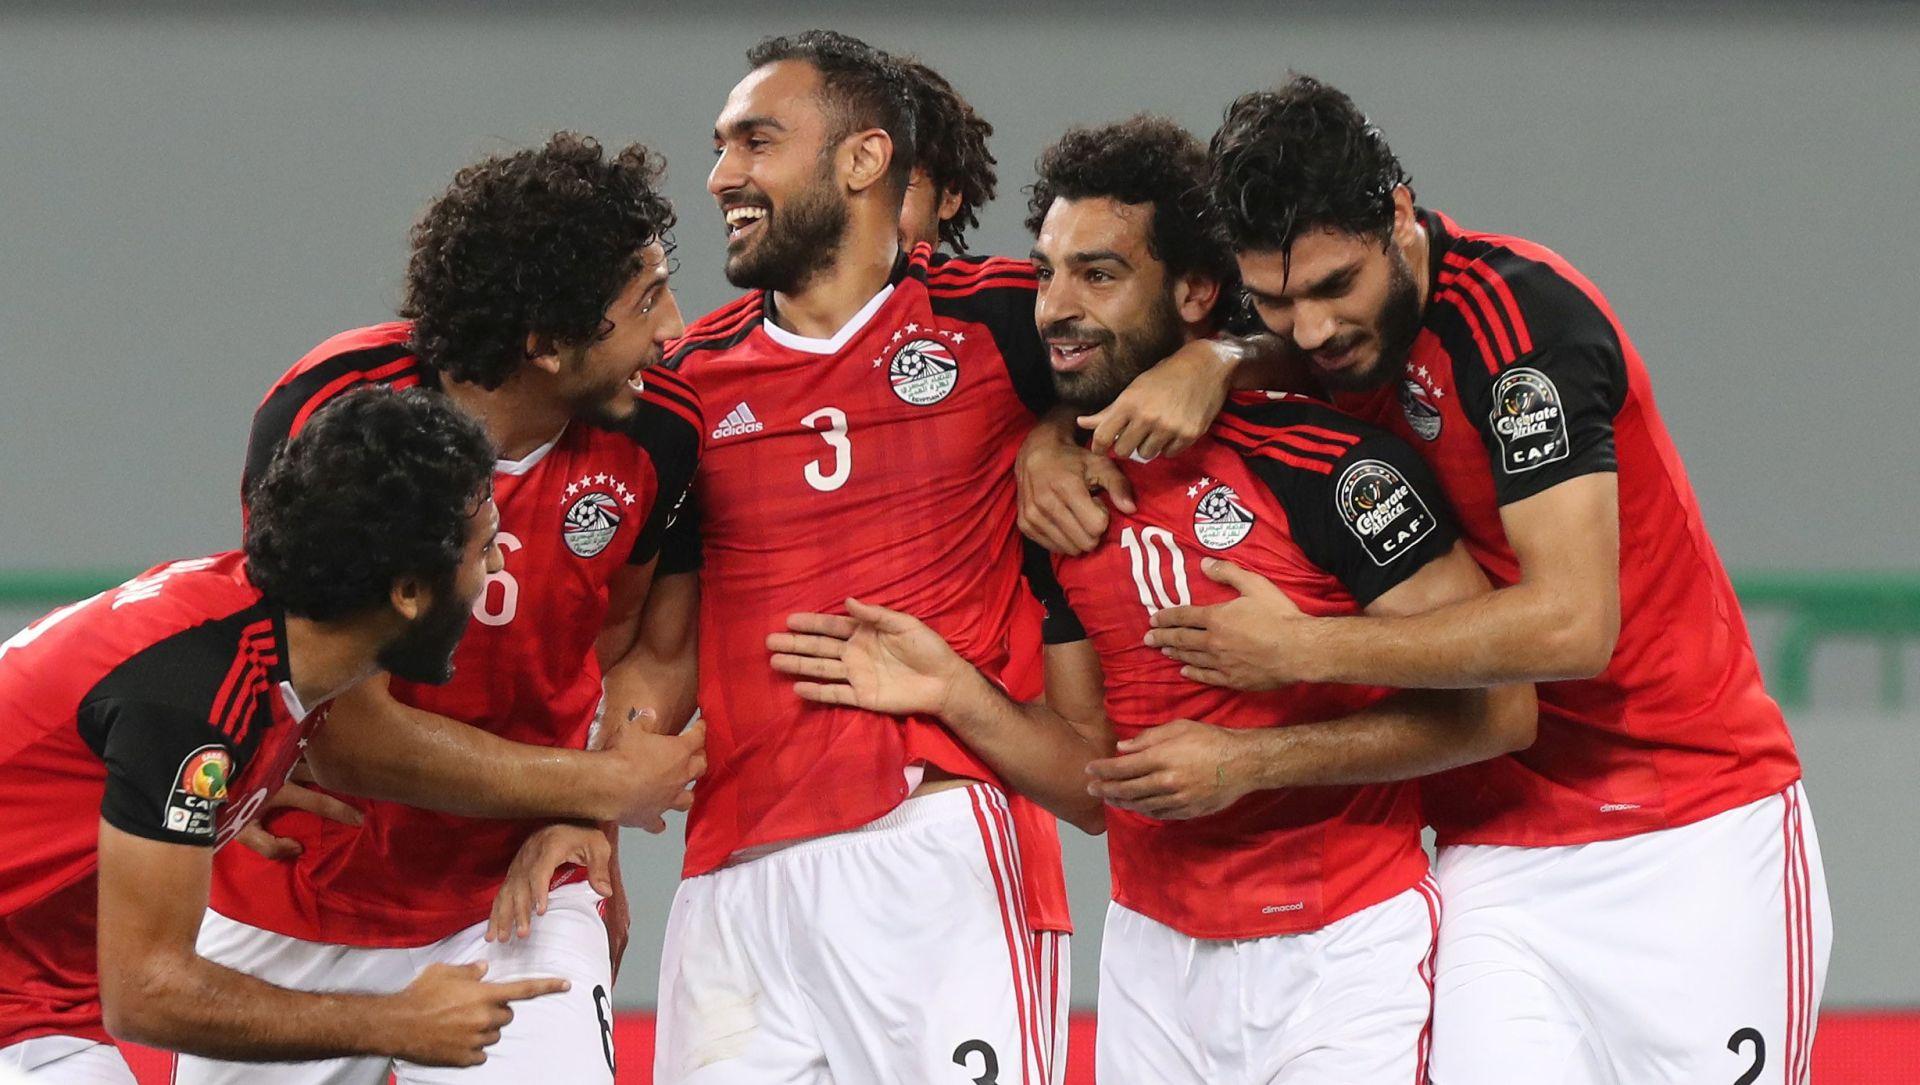 Egipat zadnji četvrtfinalist